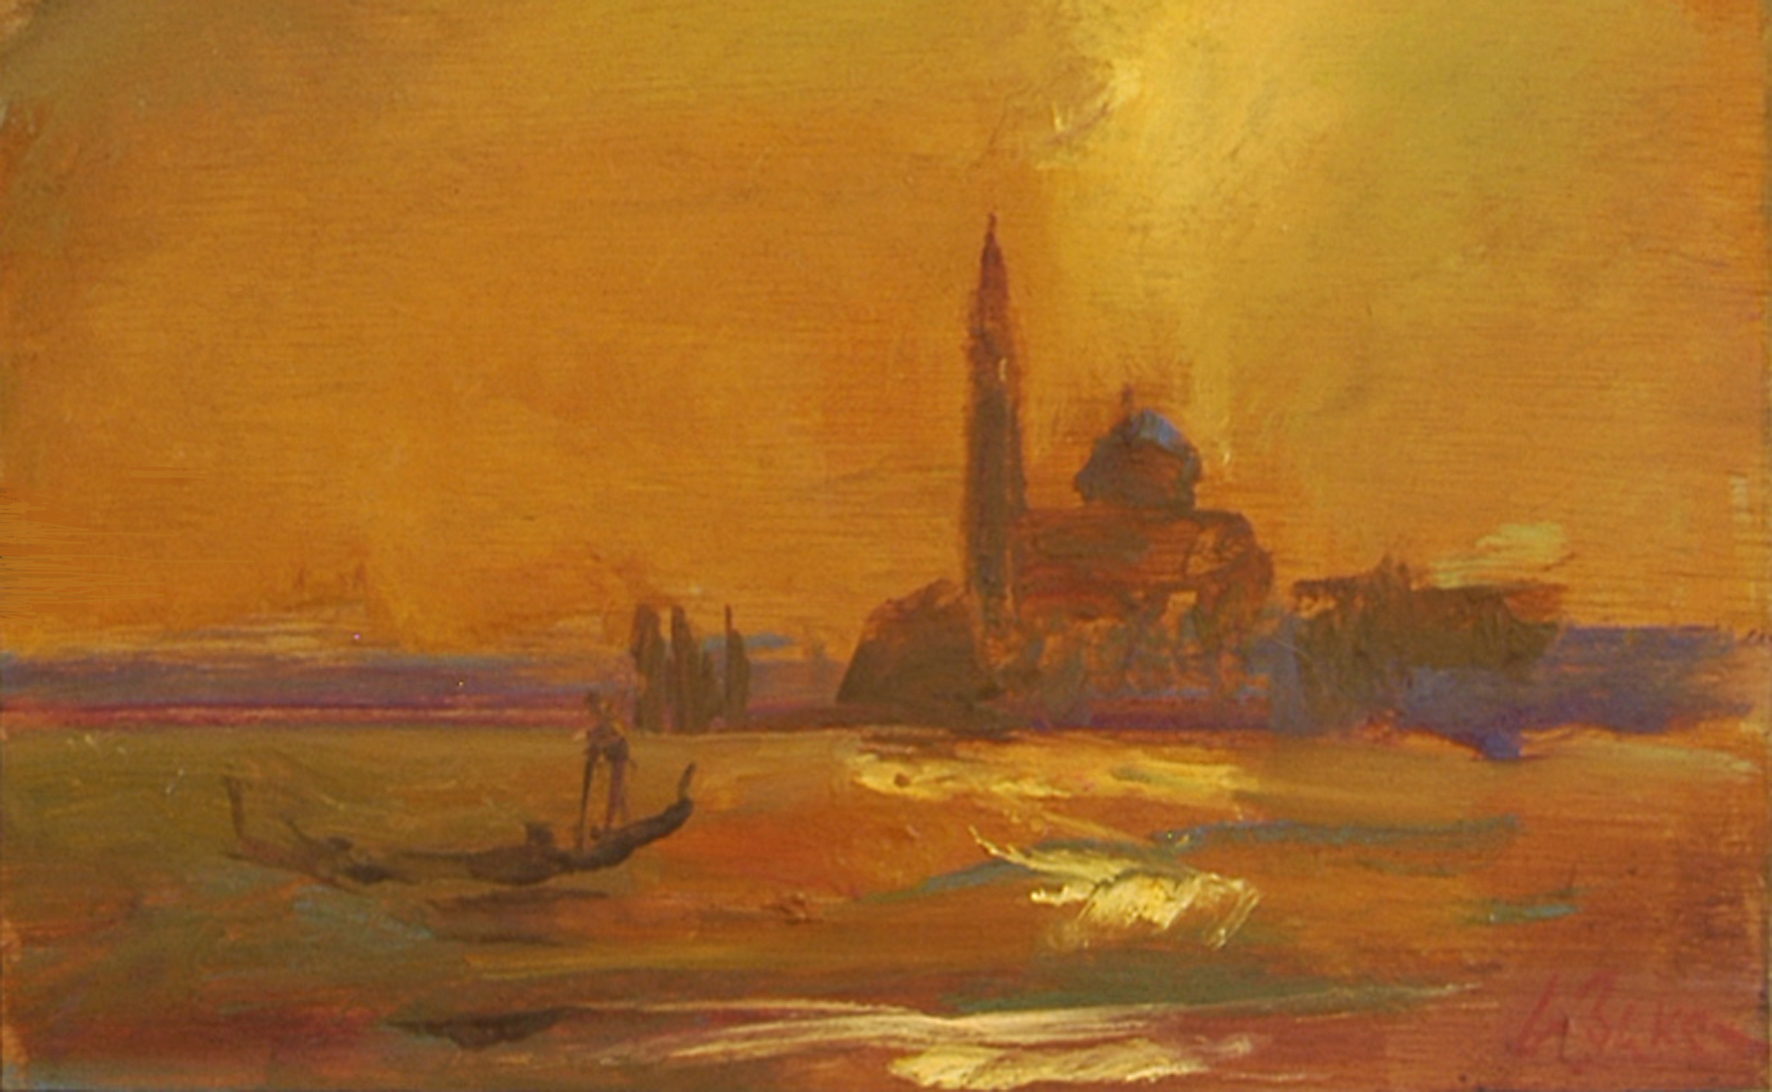 Enshrouded Gondolier (Sketch) - oil on board - 20 x 32 cm - SOLD